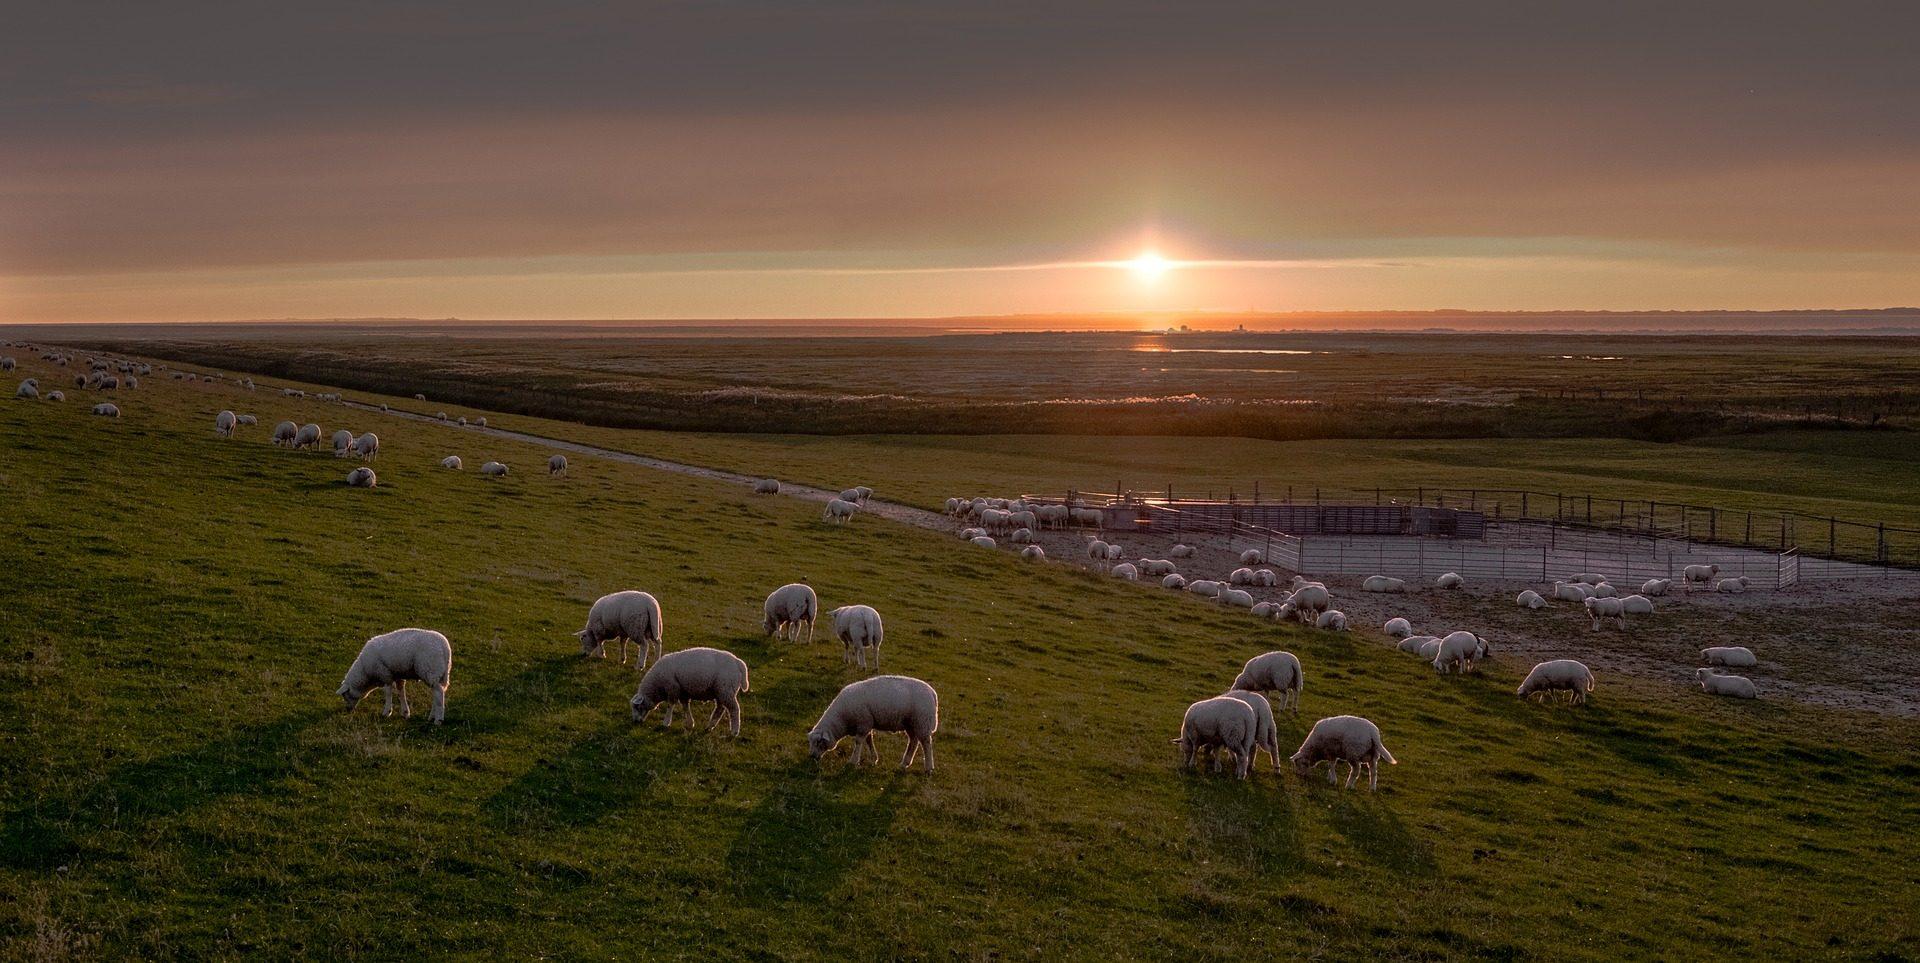 Schafe, Herde, Weiden, Vieh, PRADO, Sonne, Sonnenuntergang - Wallpaper HD - Prof.-falken.com